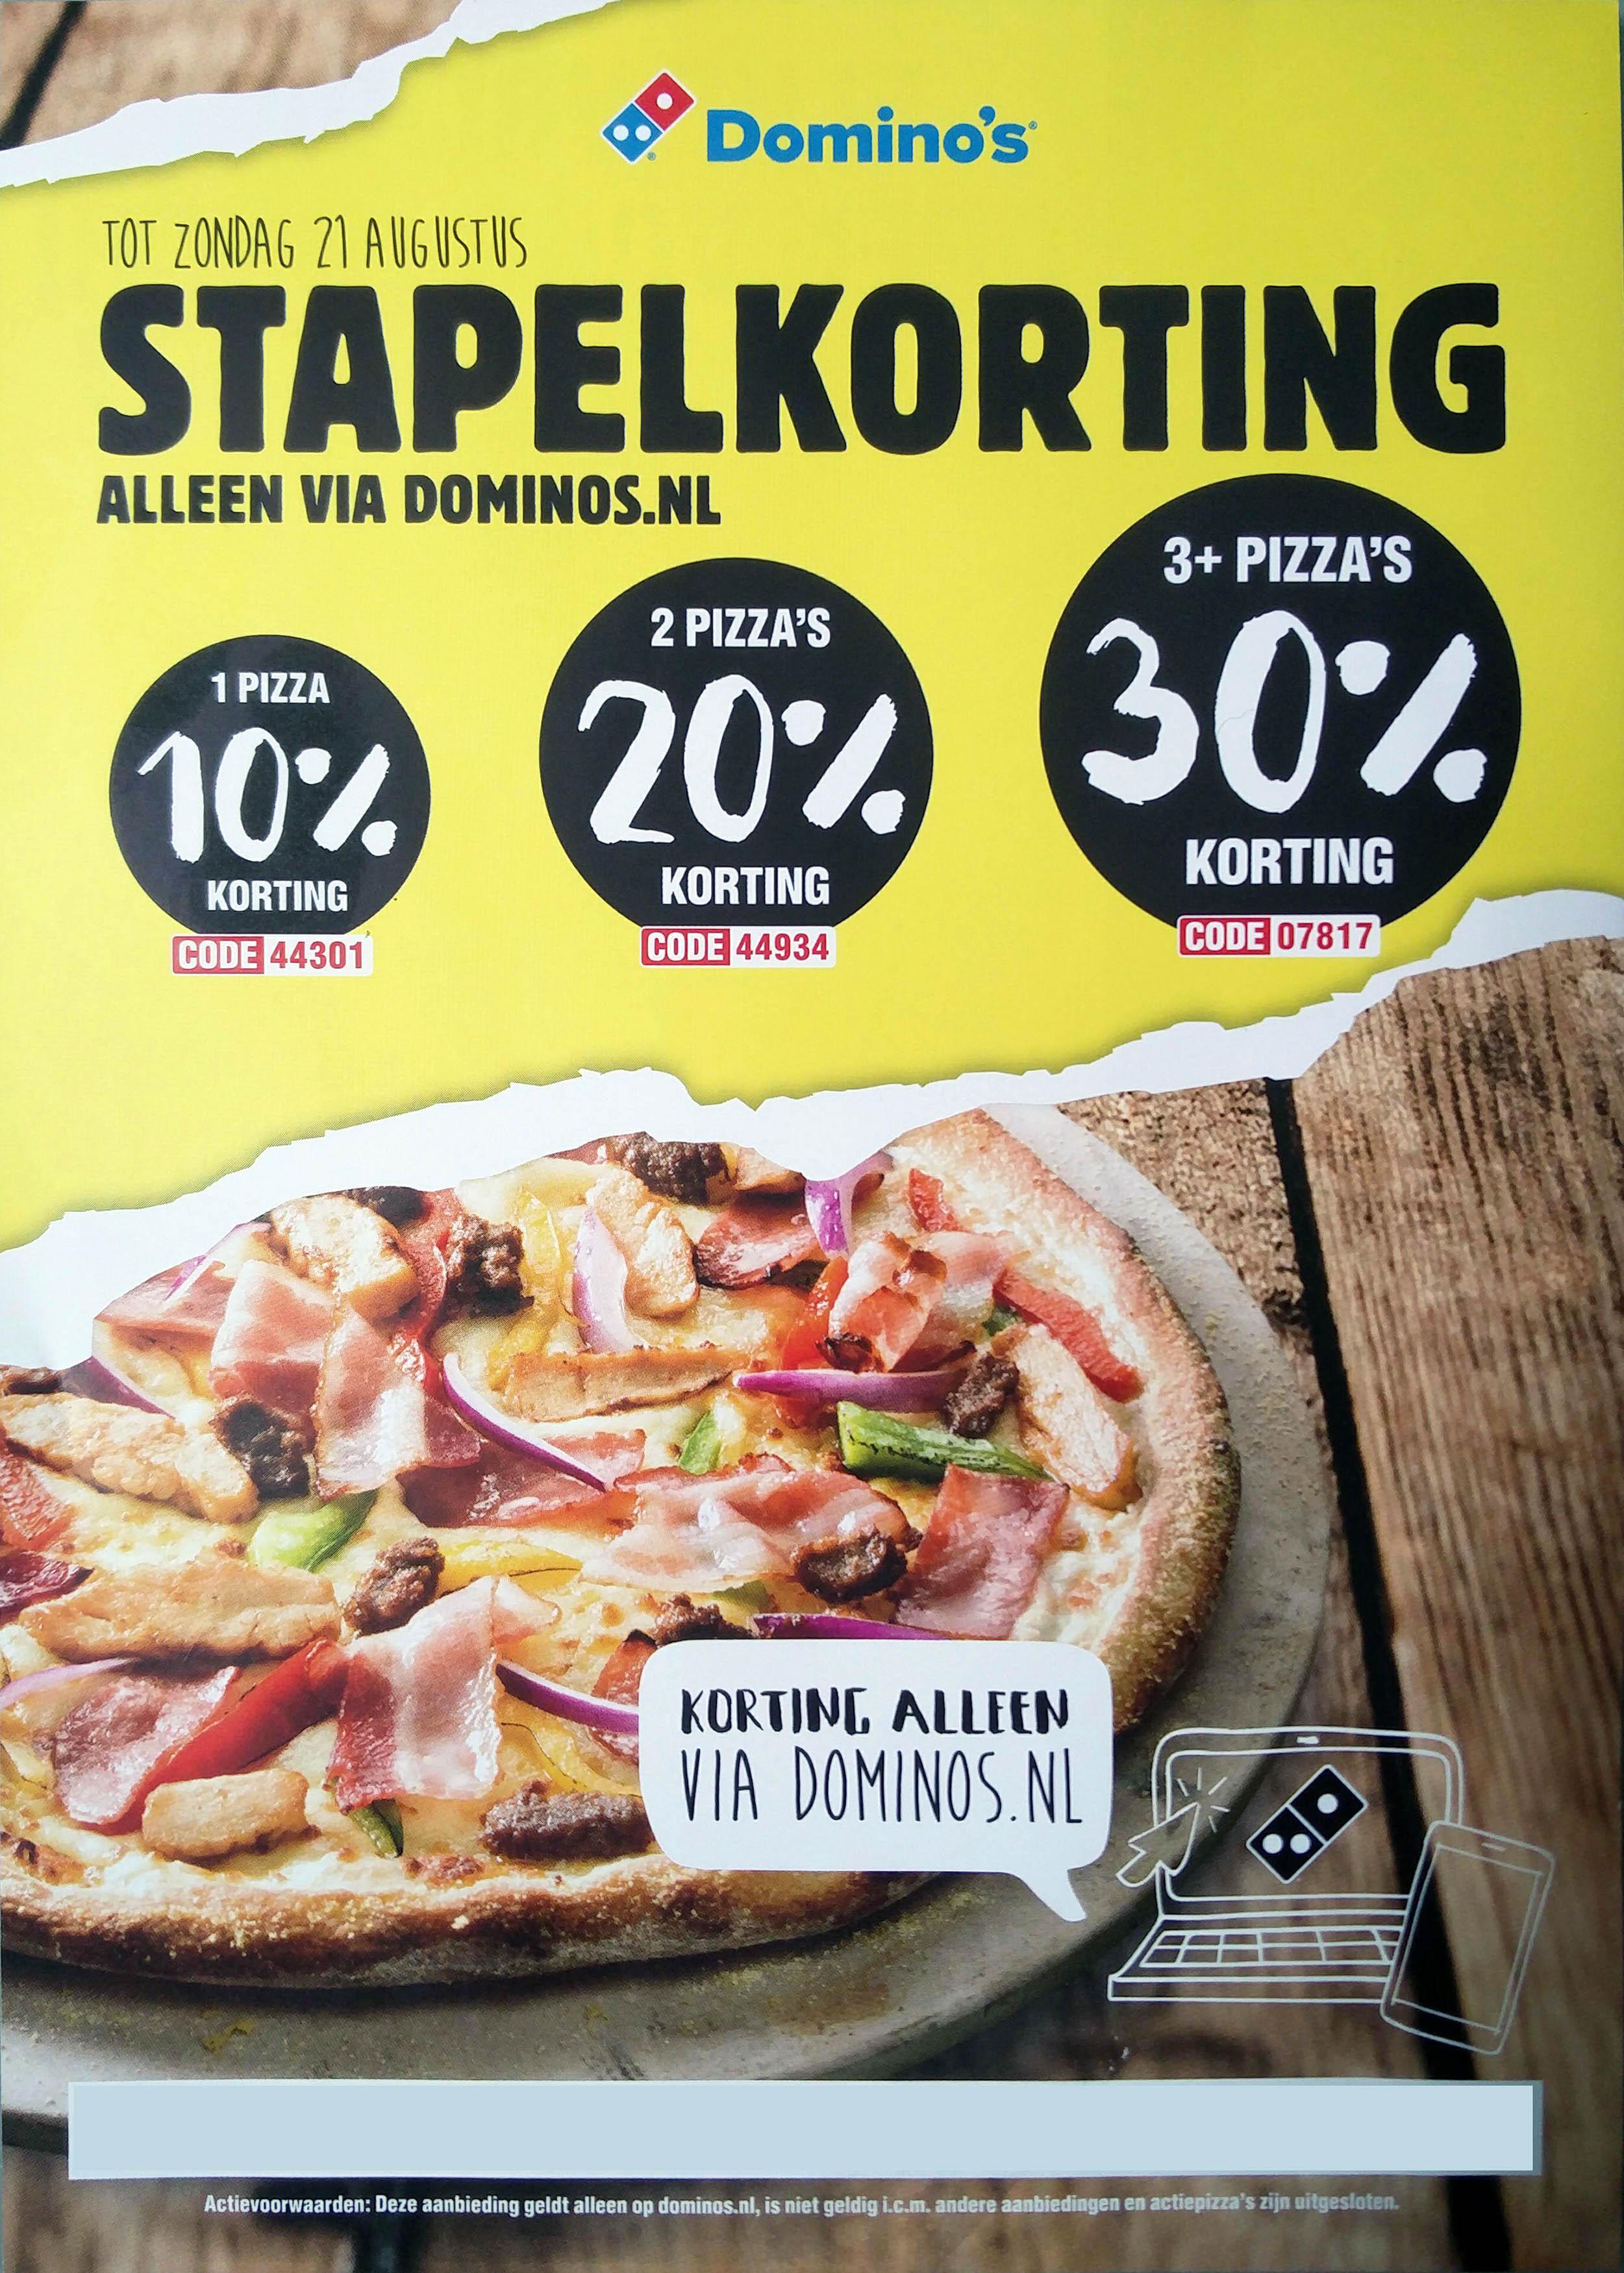 10, 20 of 30% stapelkorting bij Domino's Pizza